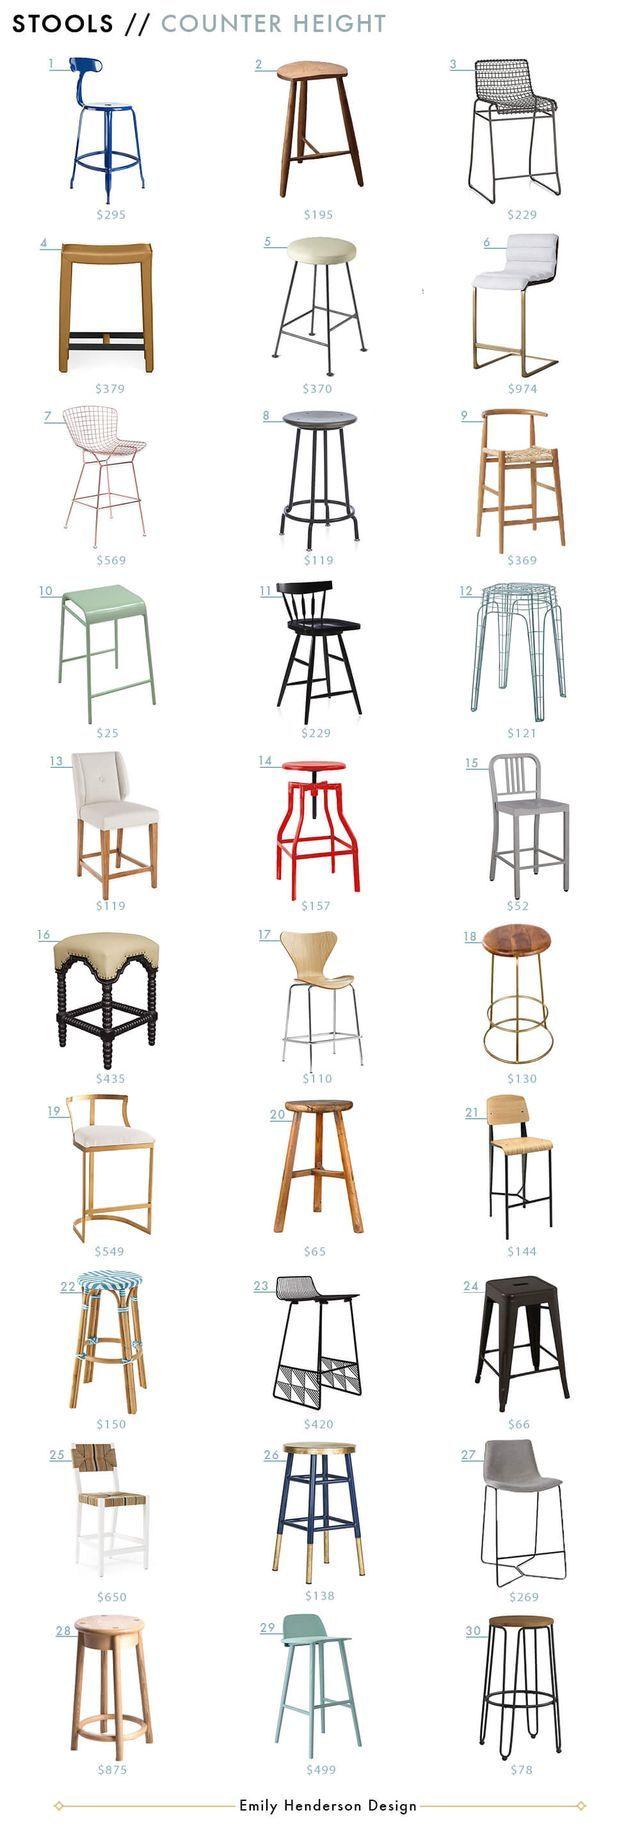 best ideas images on pinterest decks furniture ideas and wood